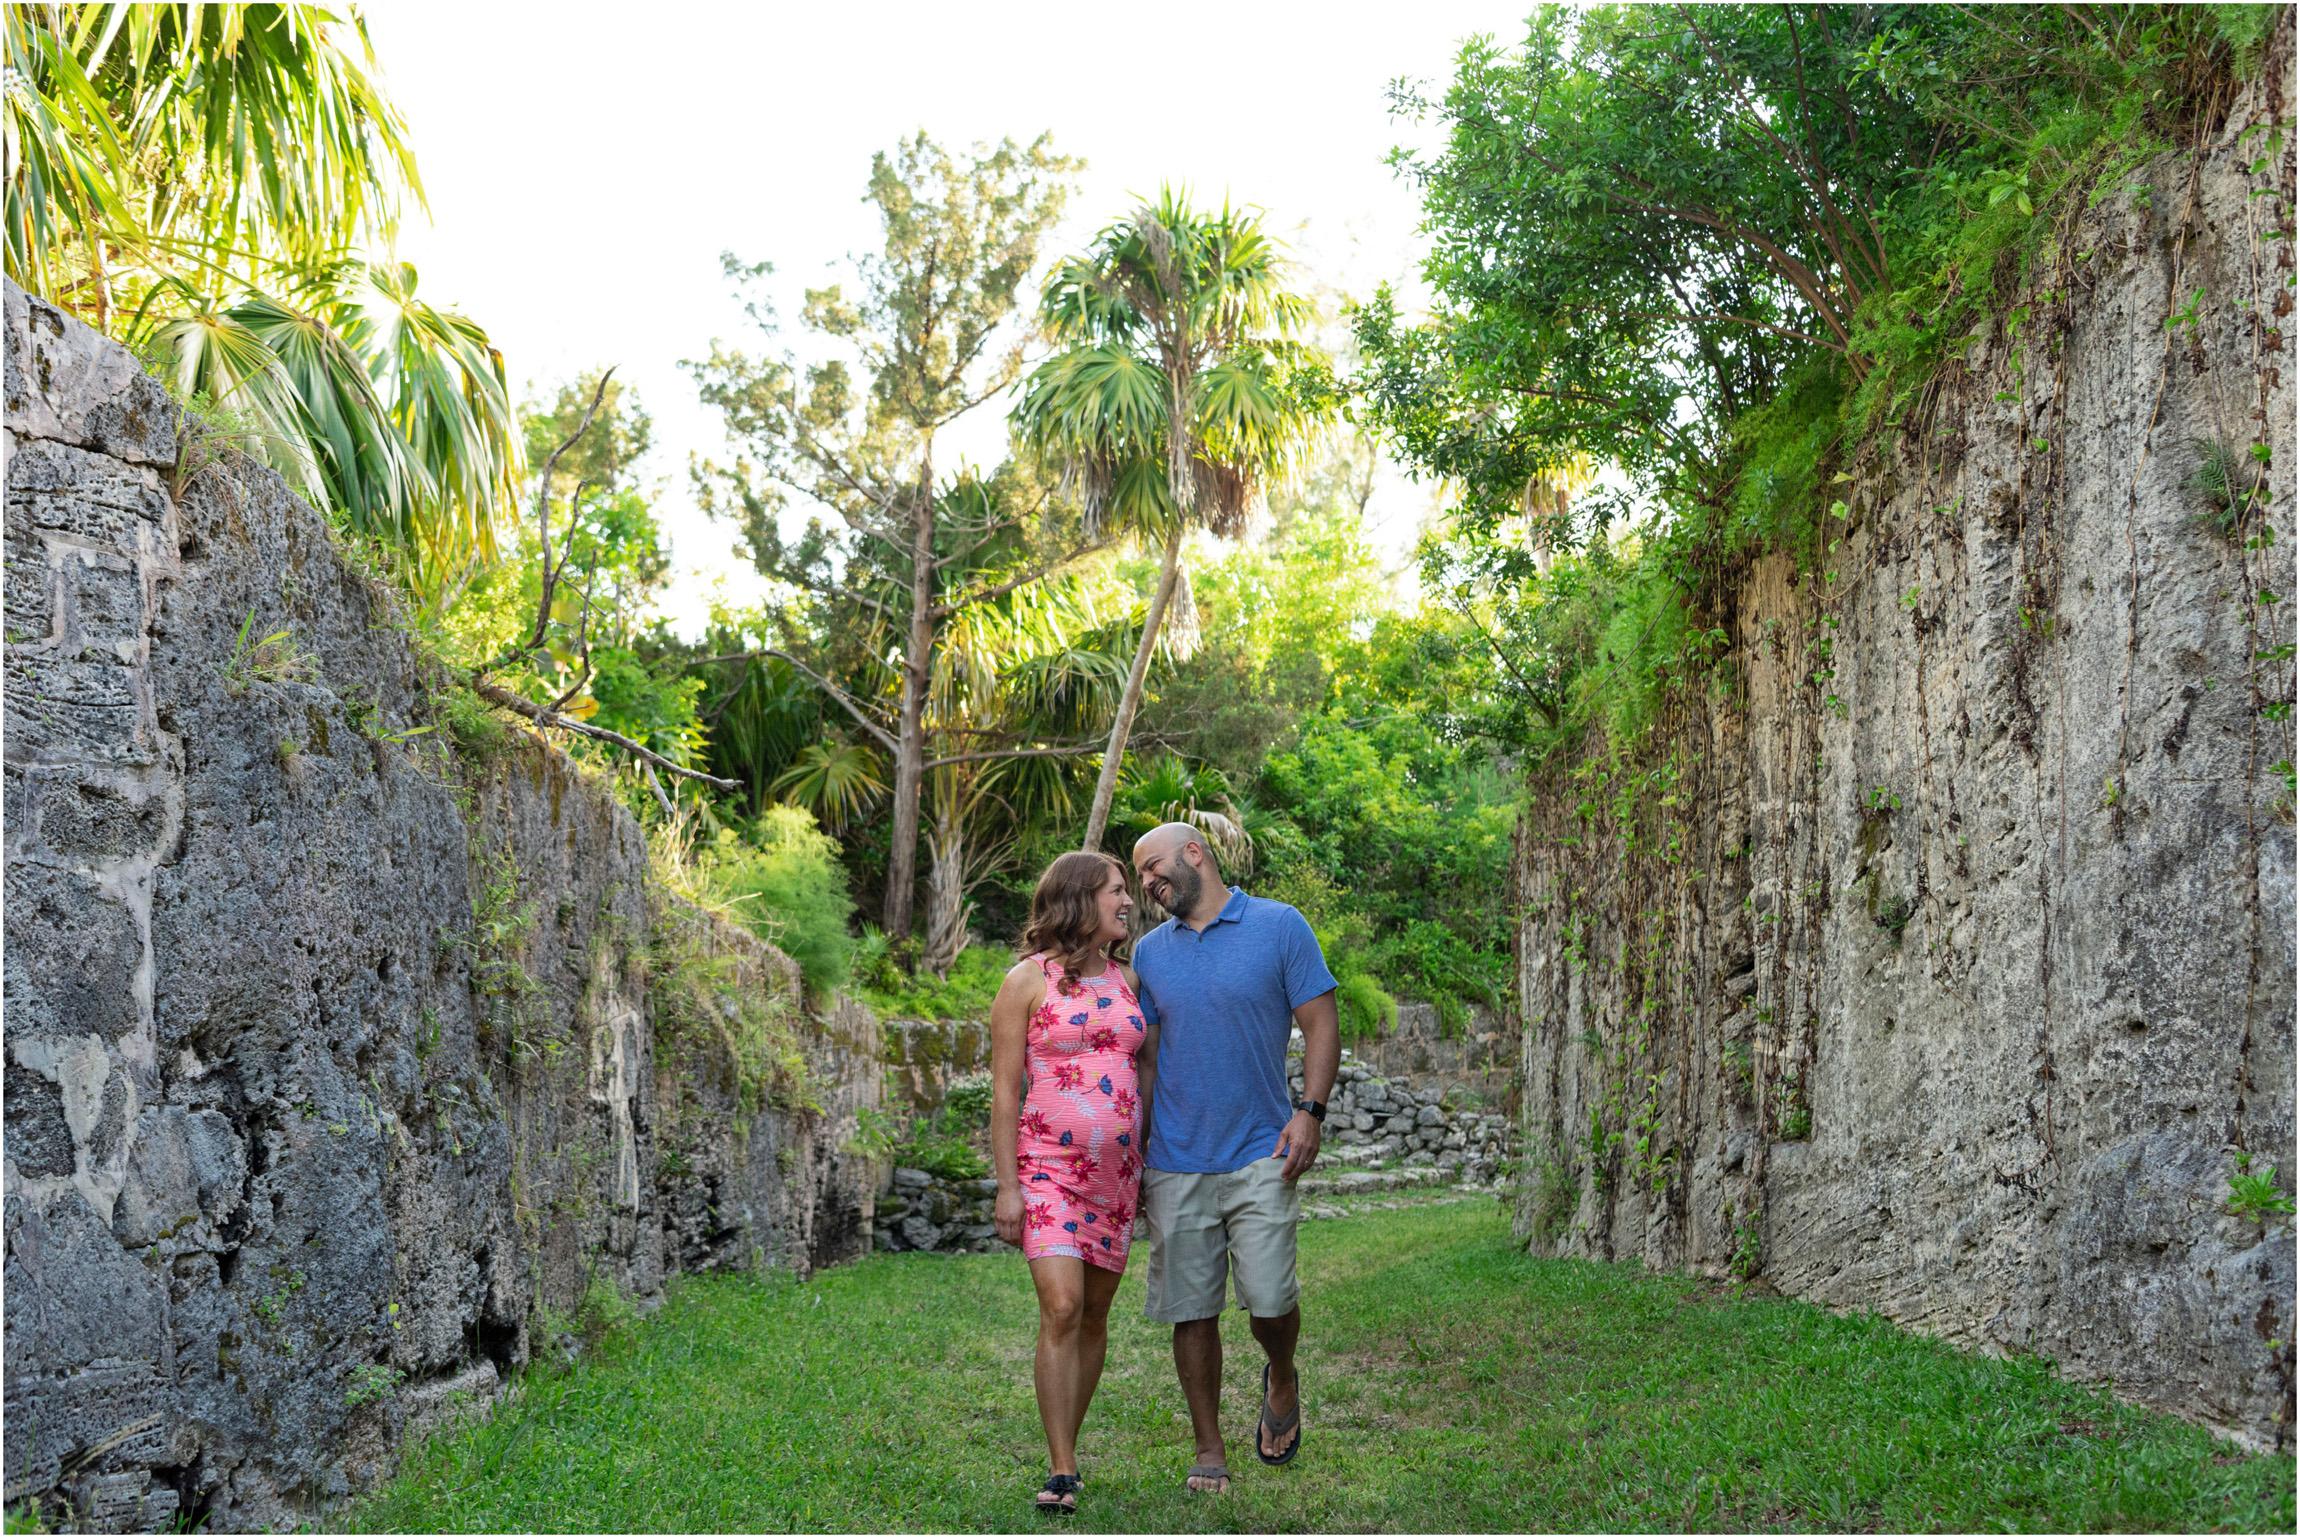 ©FianderFoto_Bermuda Maternity Photographer_Elys Harbour_Ft Scaur_Airbnb_Victoria_Mike_009.jpg